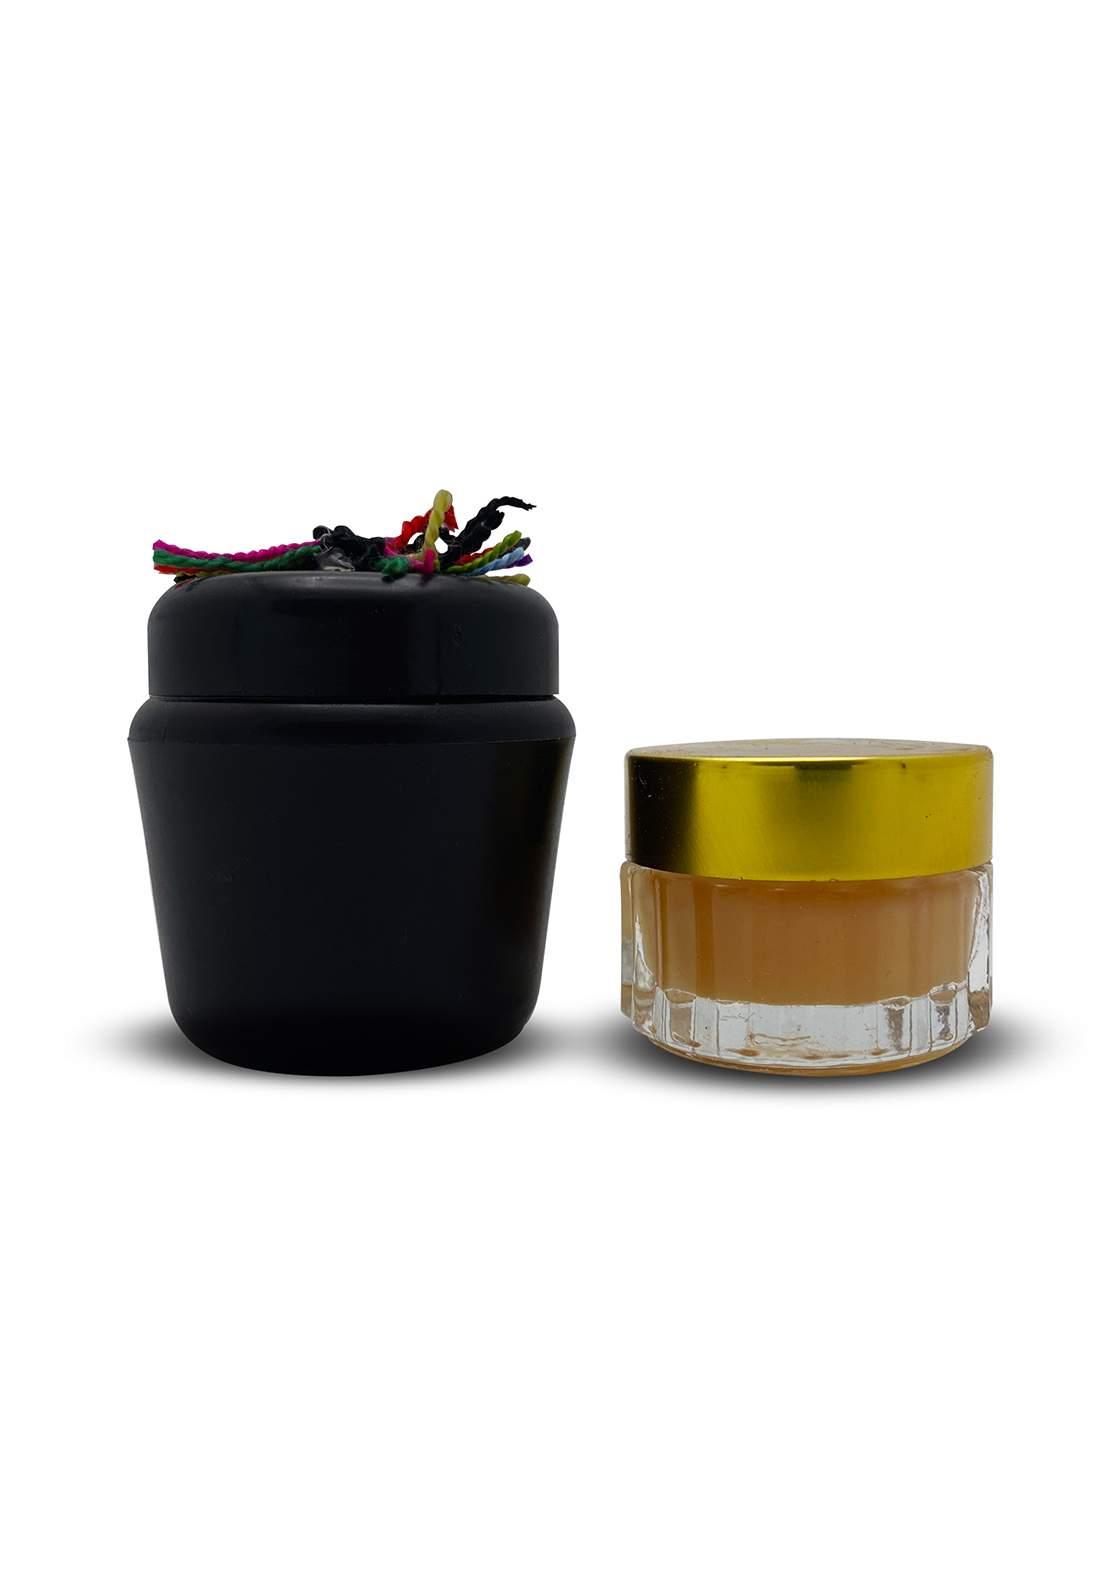 Passion Lip Care Products Scrub And Moisturizing 40+15 Ml مجموعة العناية بالشفاه